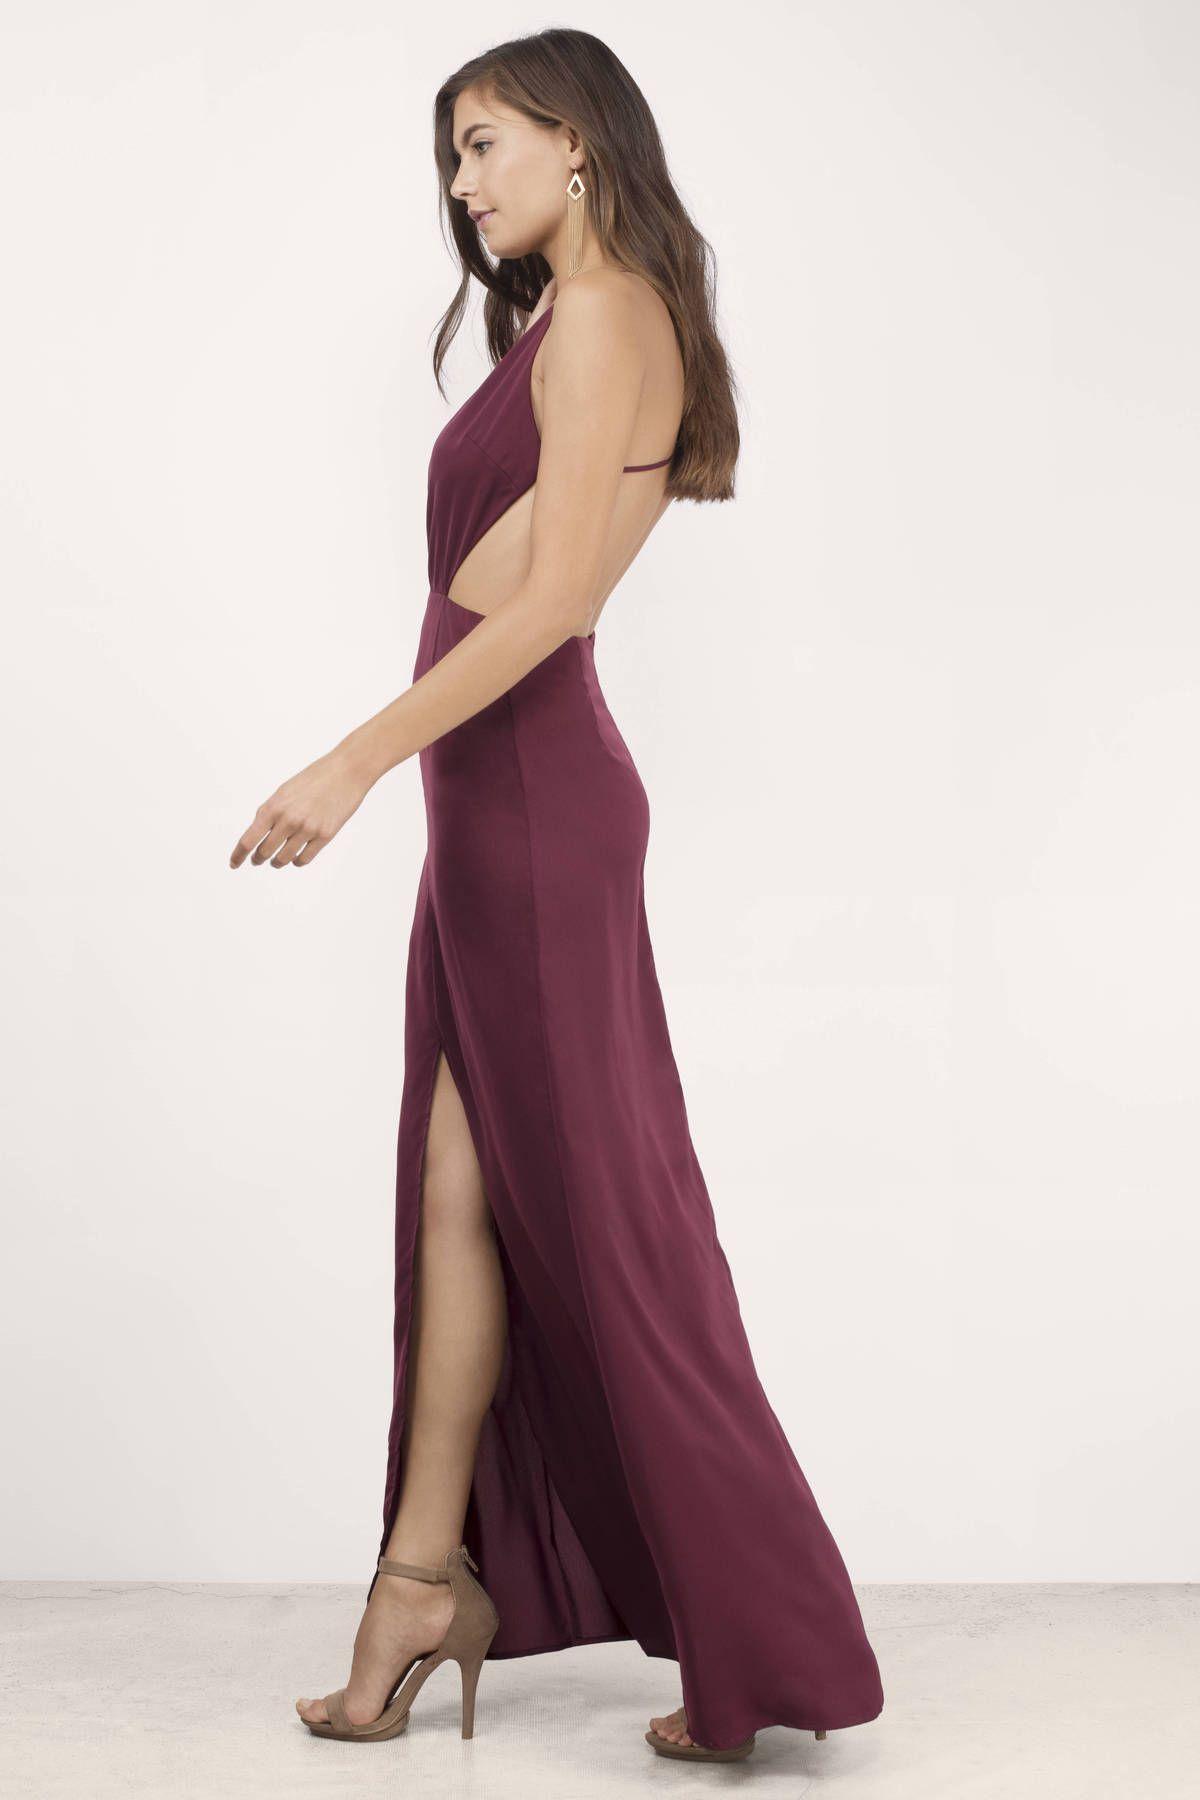 c5d579554bf test page 6, Tobi, Wine Bold Move Maxi Dress | prom | Pinterest ...